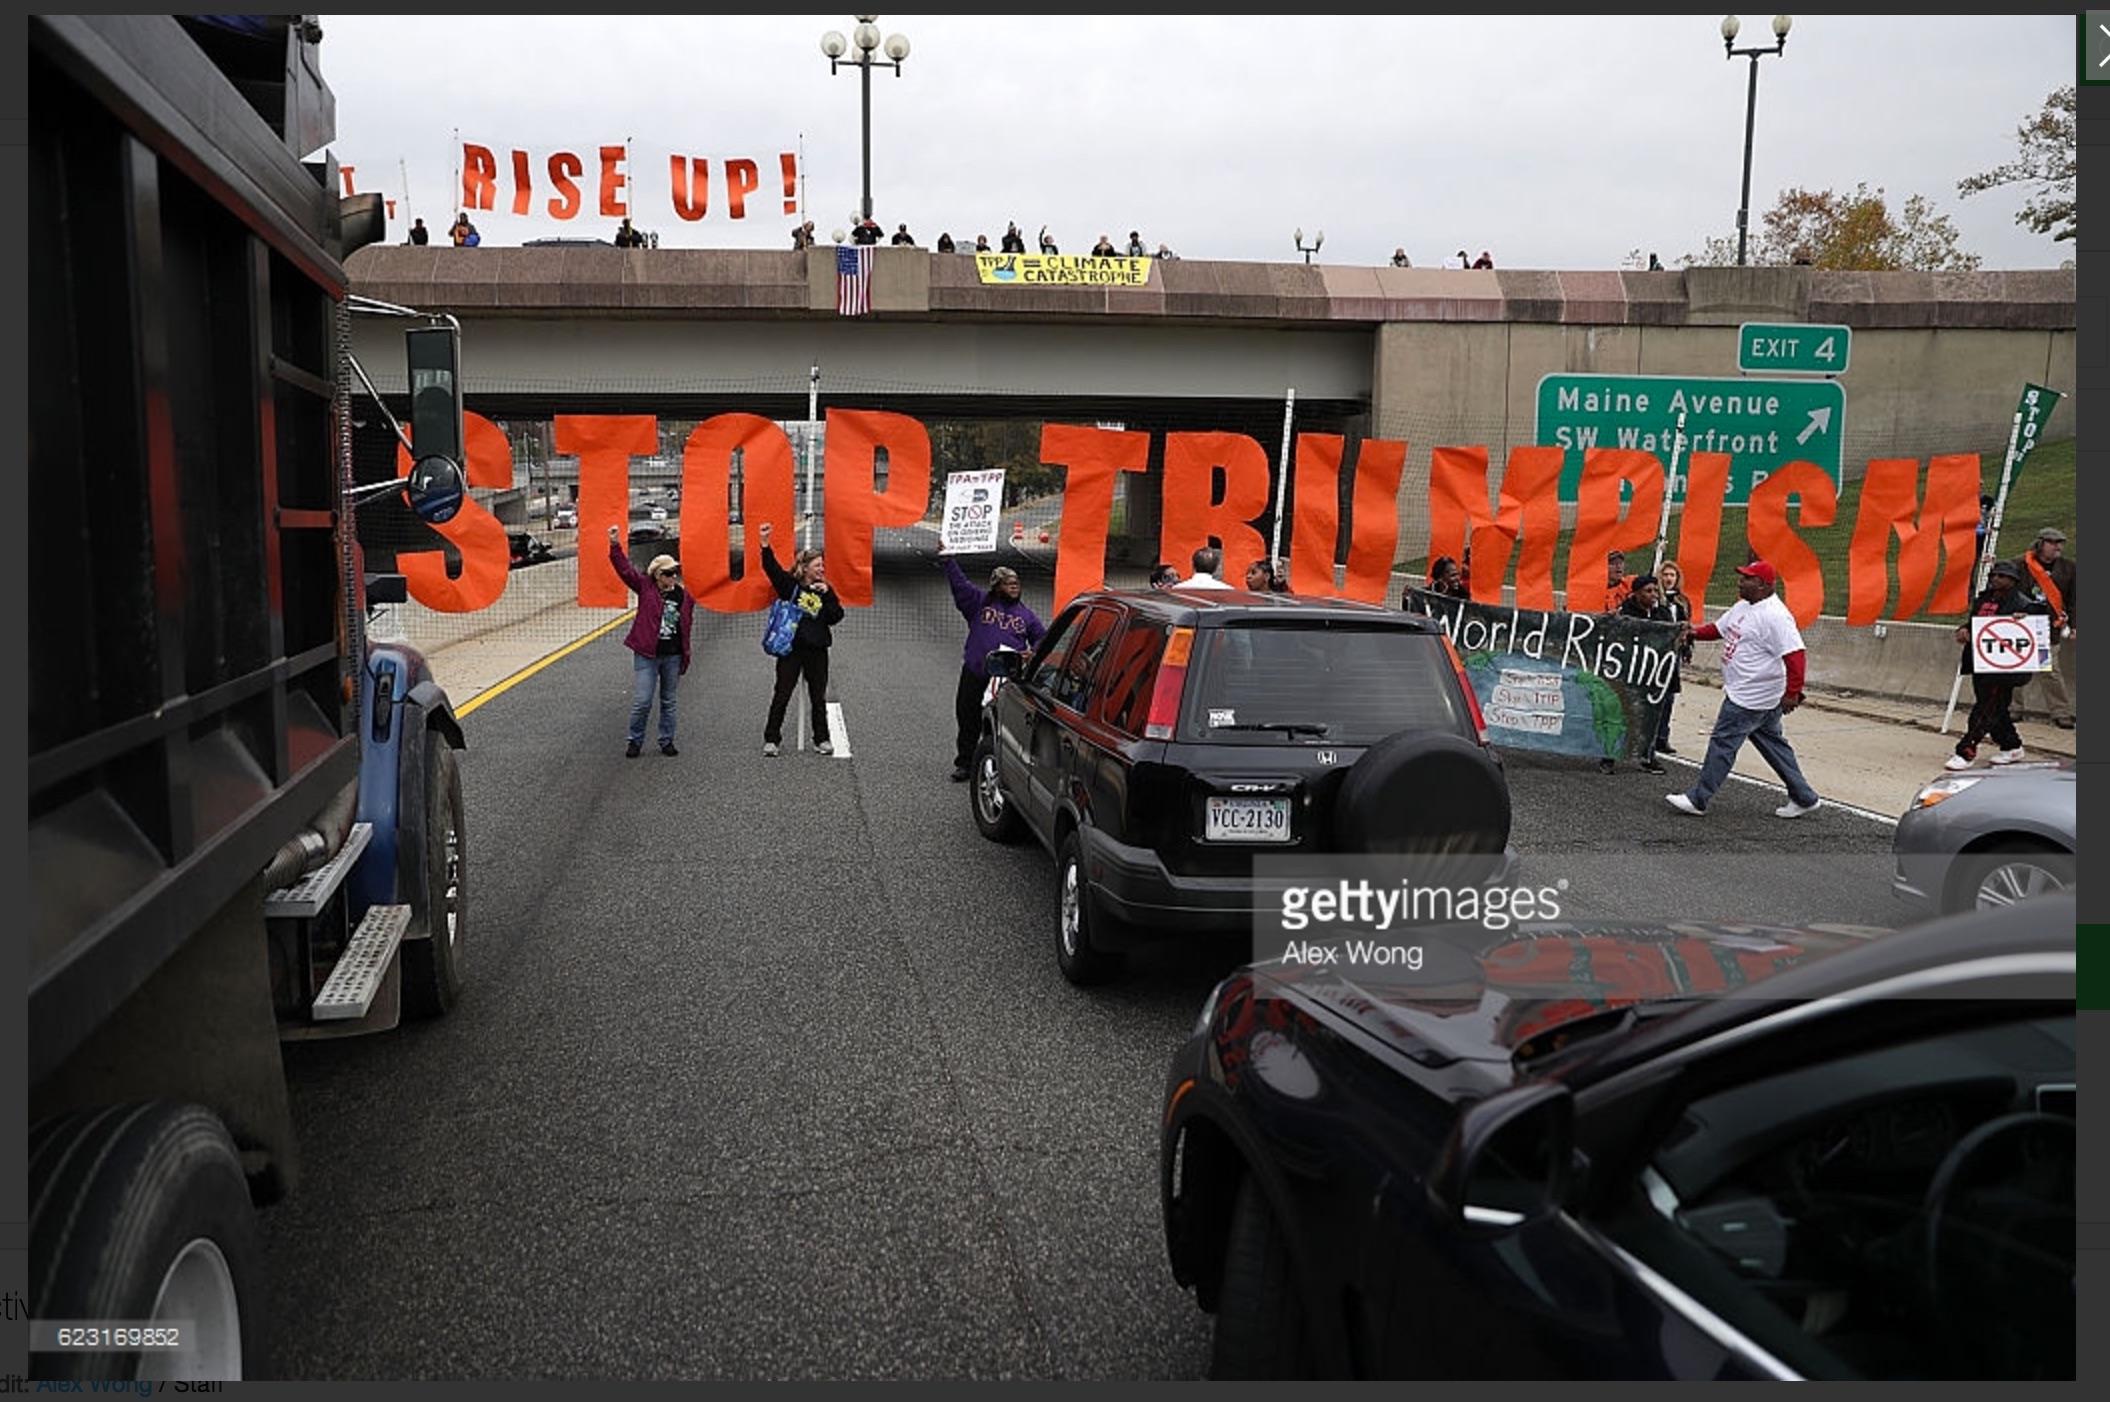 StopTrumpism-Blockade.jpg